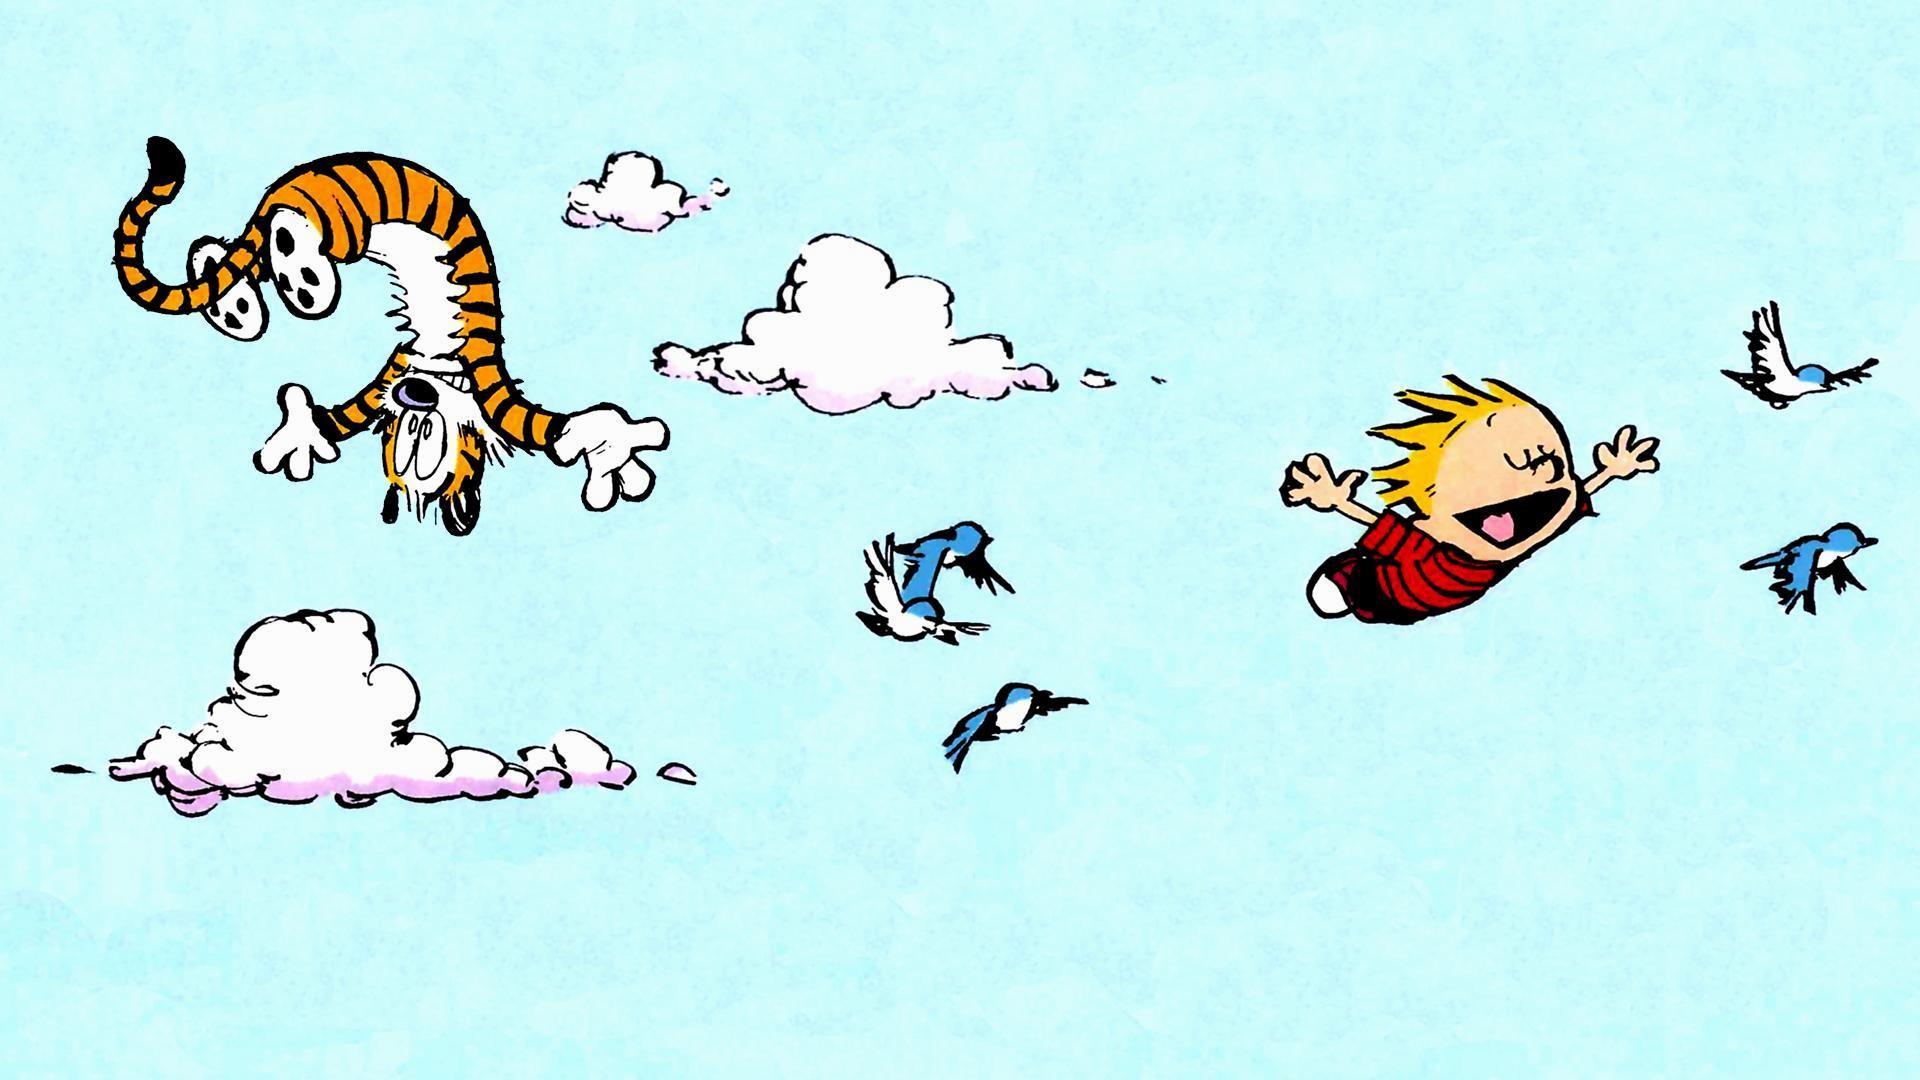 Calvin-and-hobbes-hd-wallpaper-cute-images